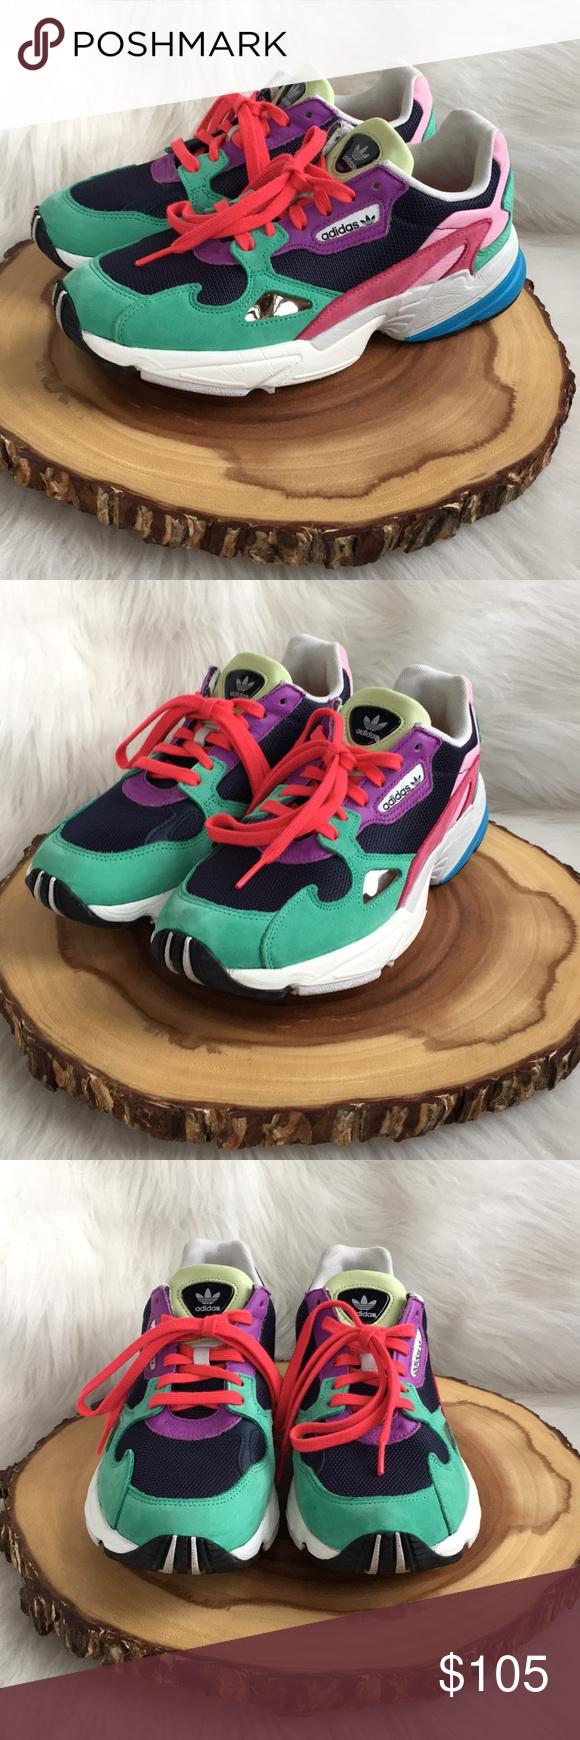 Experto Dictadura Leche  Adidas torsion colorful leather sneakers | Colored leather, Adidas torsion,  Shoes sneakers adidas